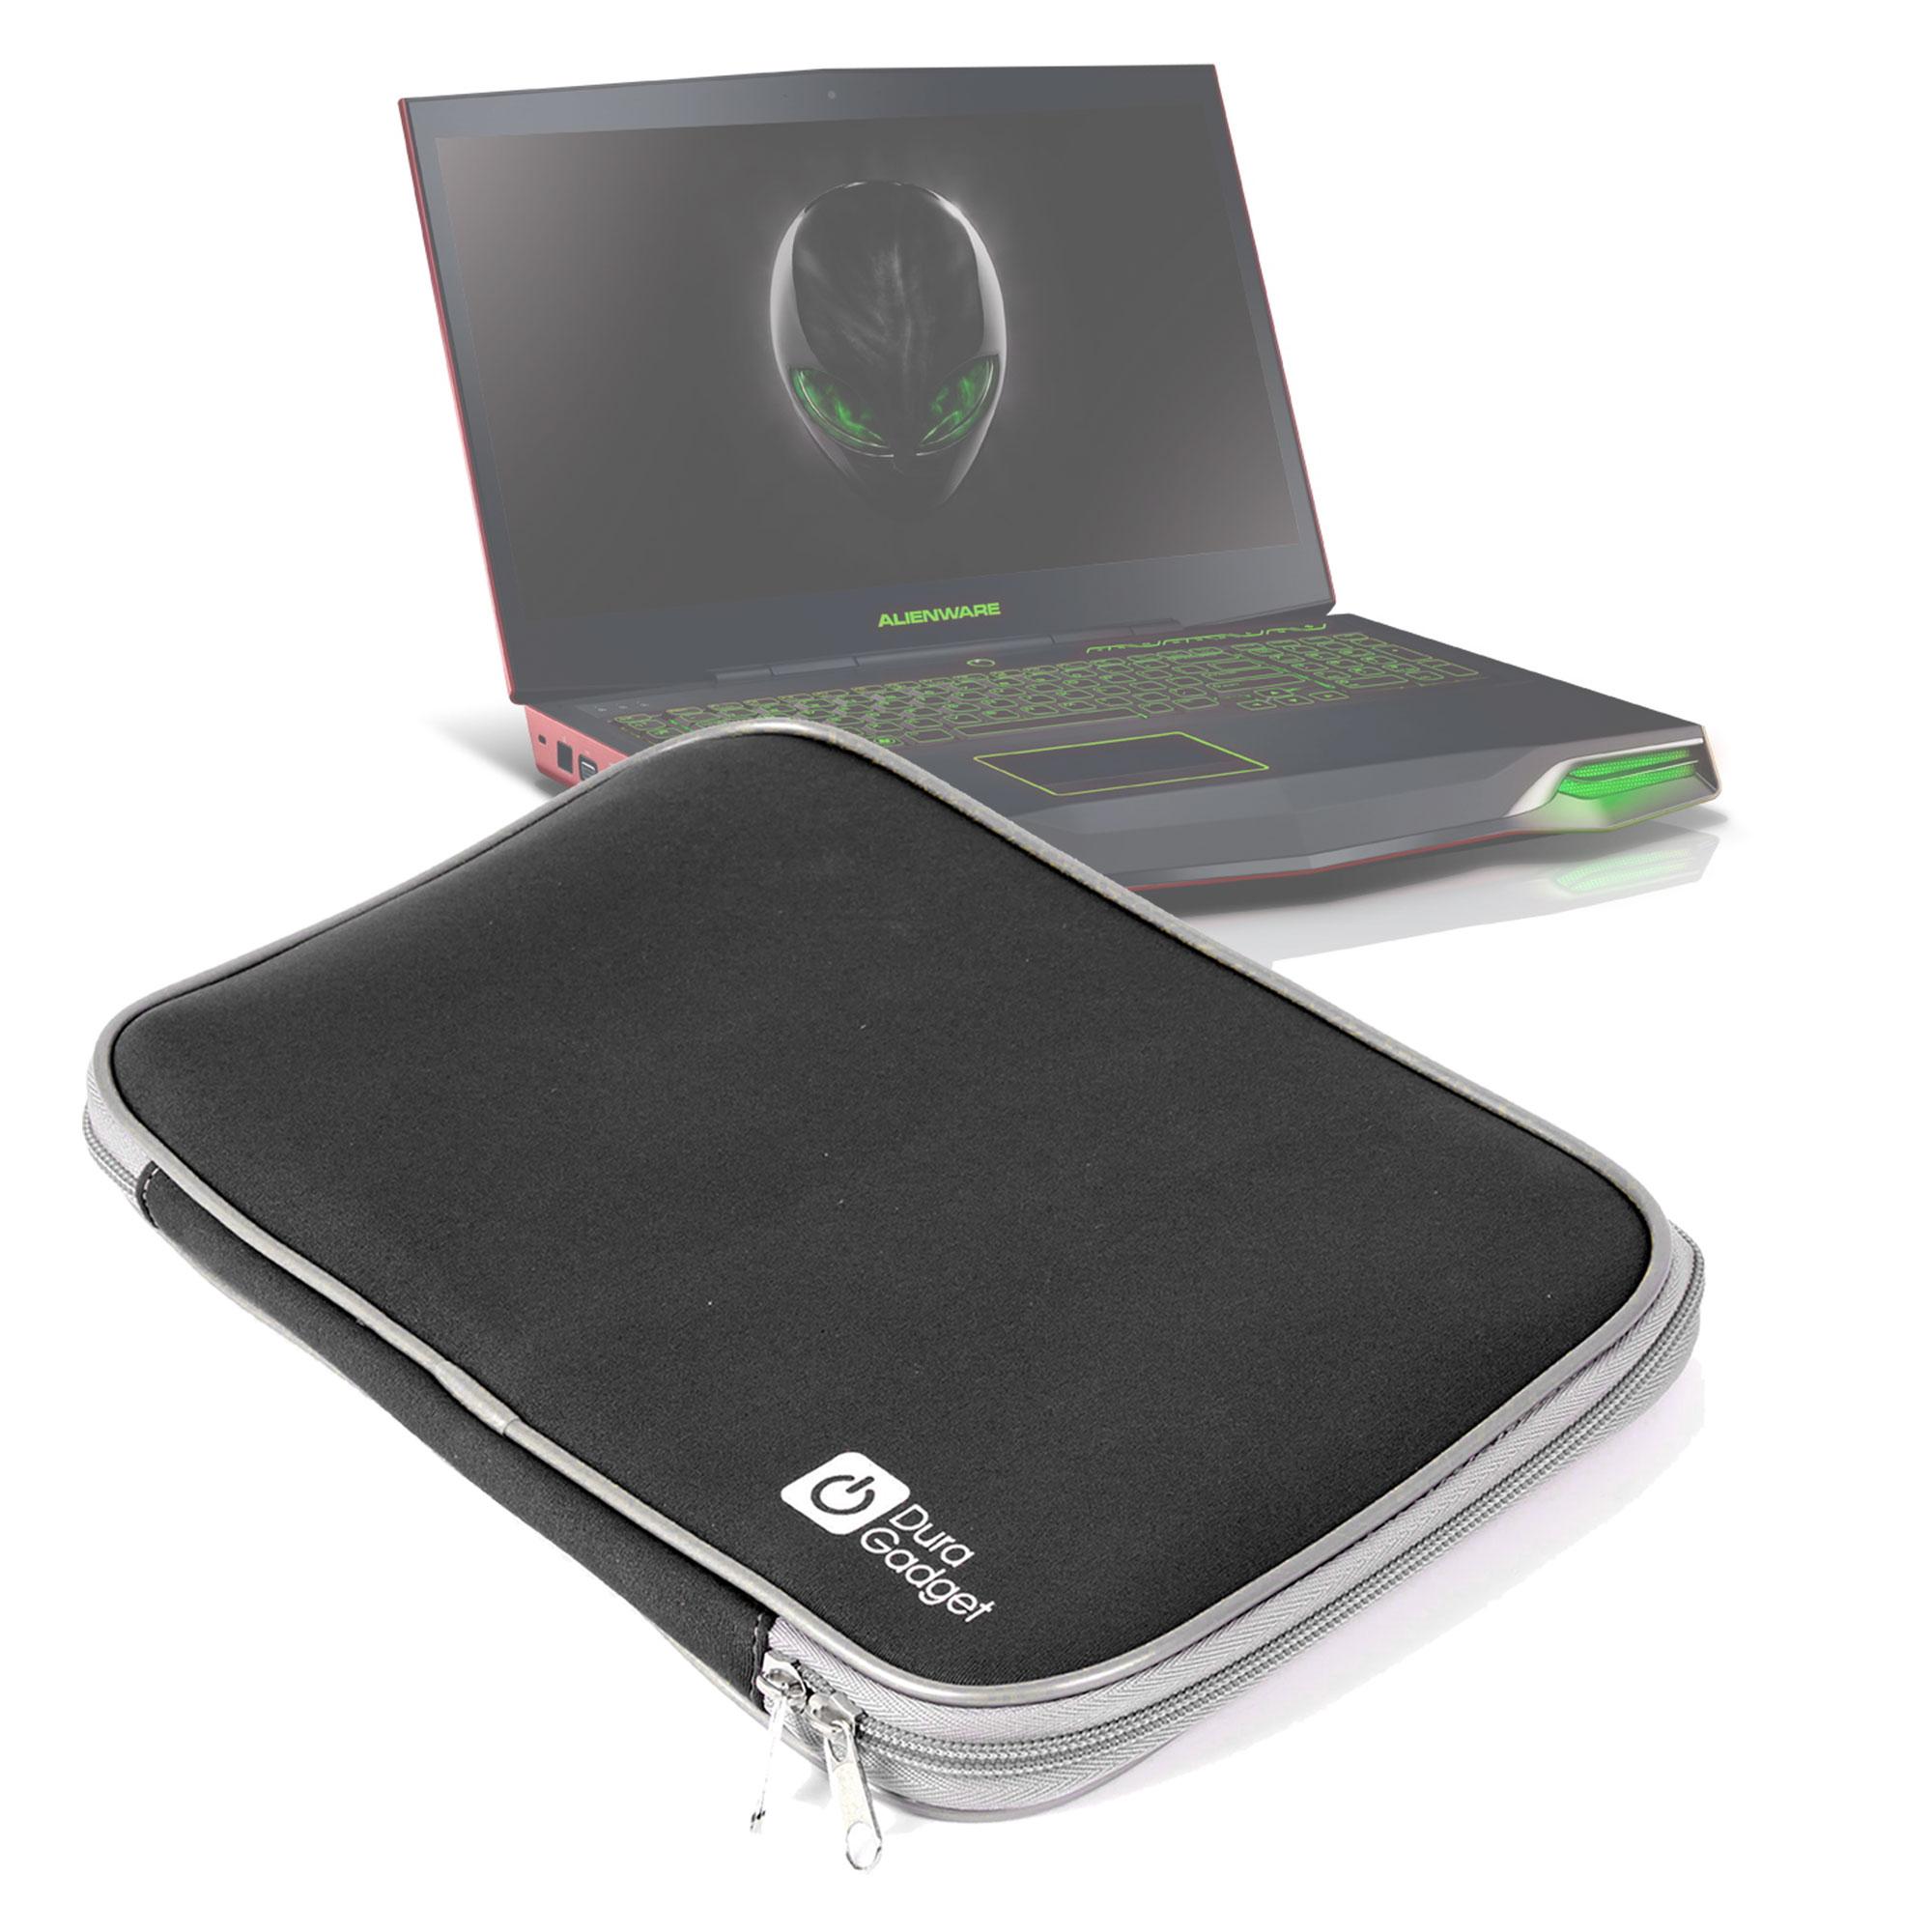 "Cool 17"" 17.3"" Neoprene Laptop Carrying Bag Sleeve Case Cover Holder+Hide Handle For Dell"